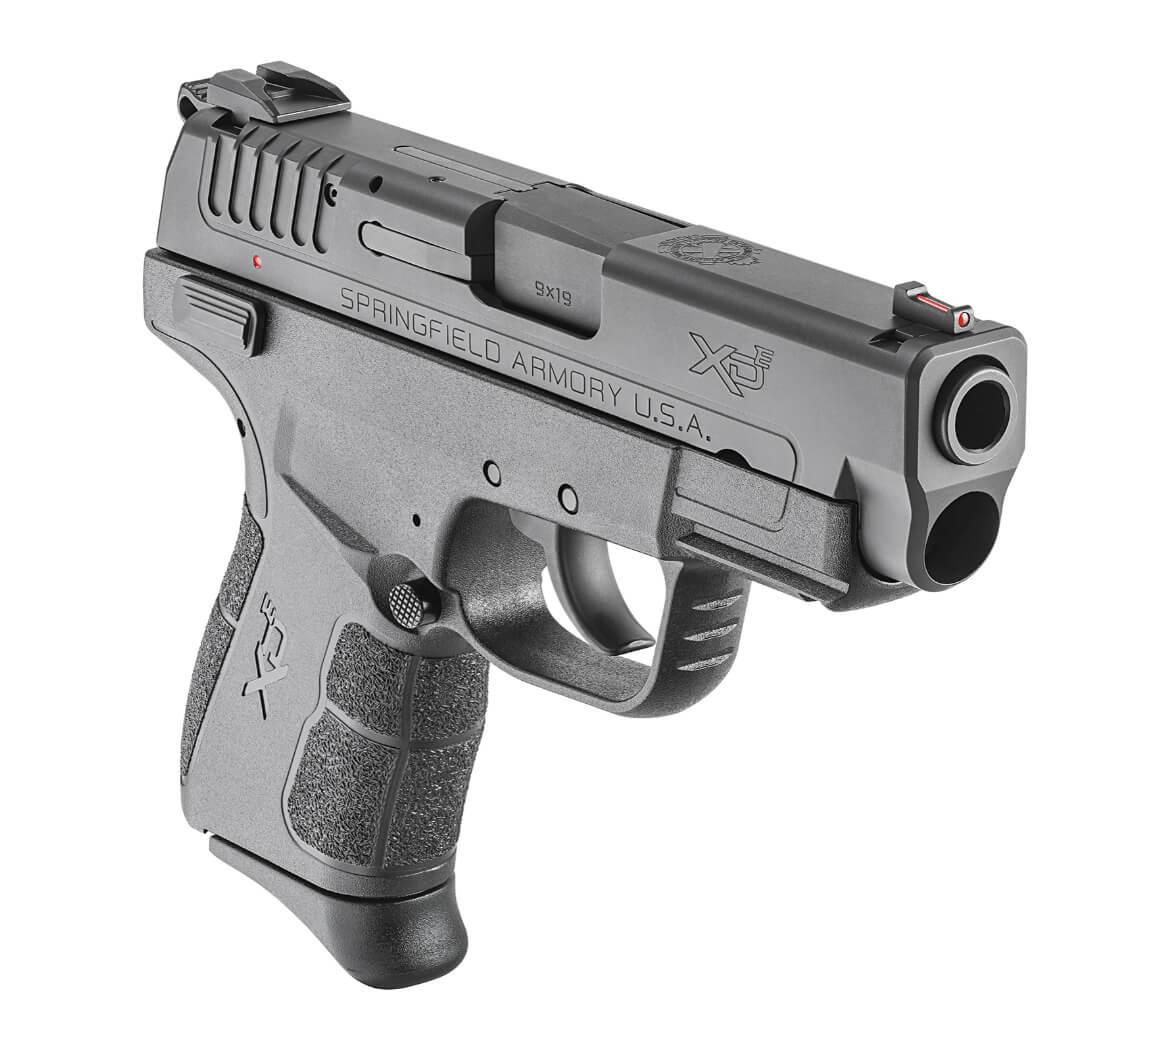 XD-E by Springfield Armory